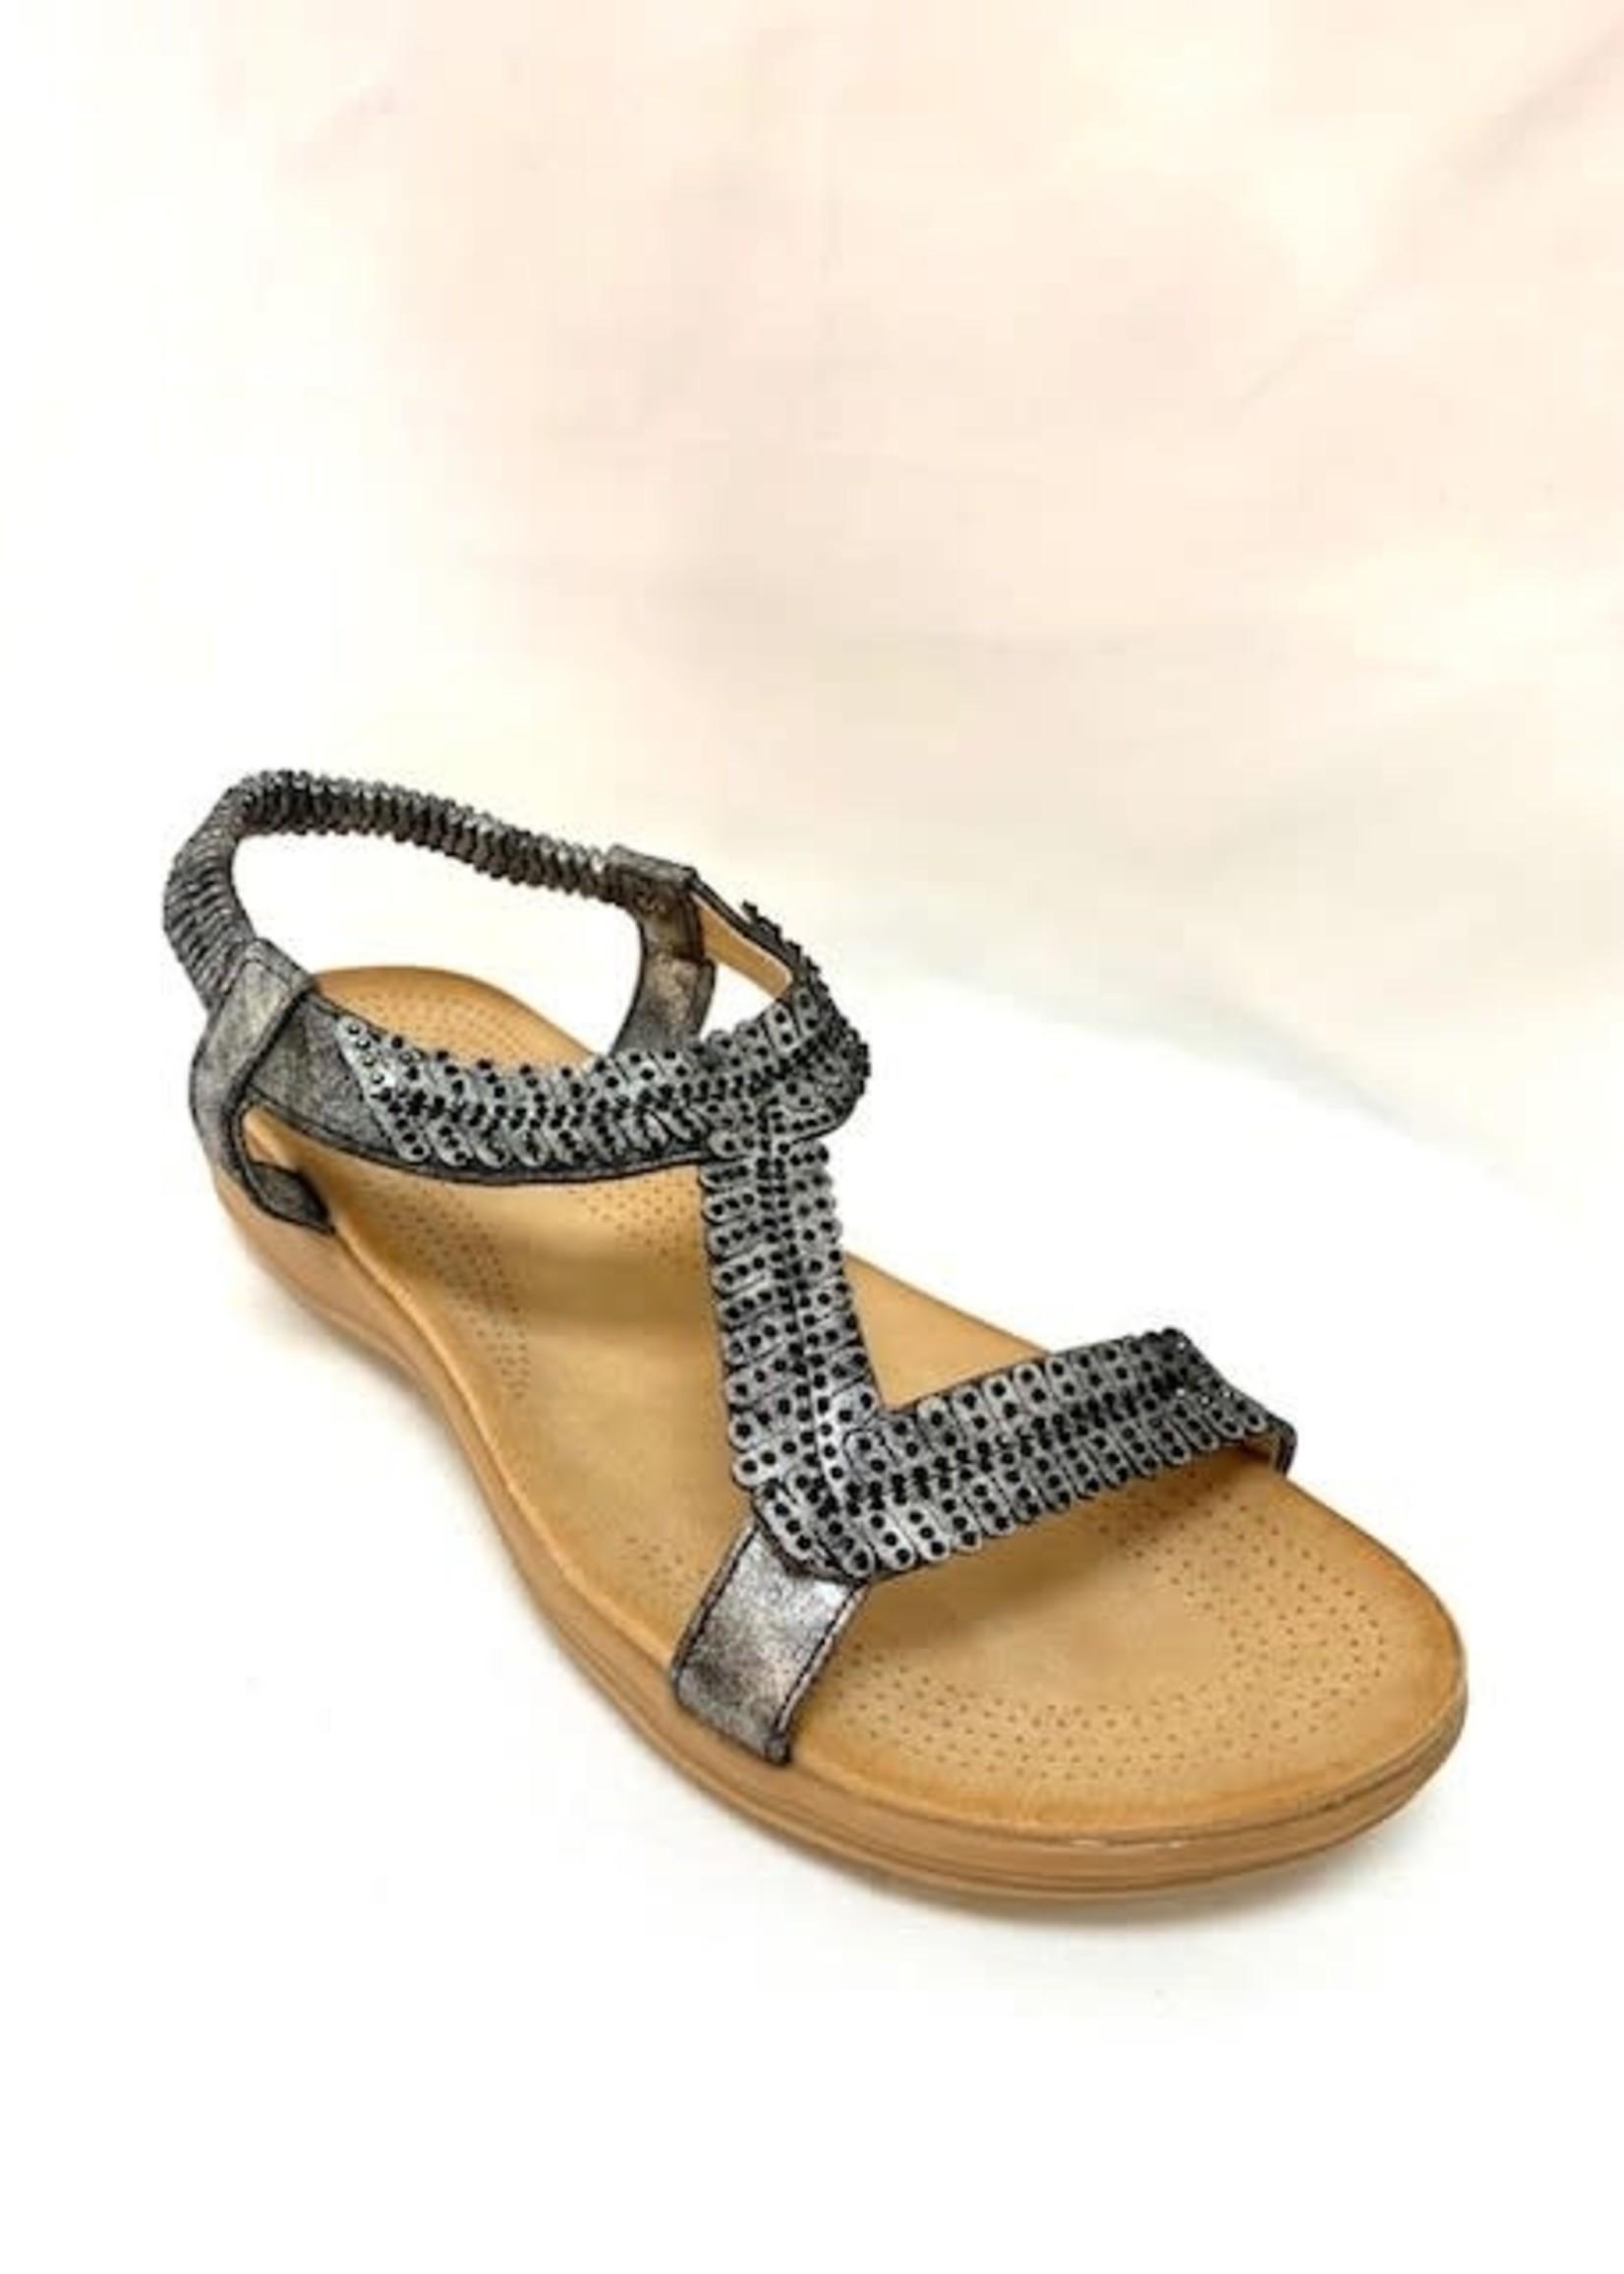 JJ Ladies sandals, three variant colors